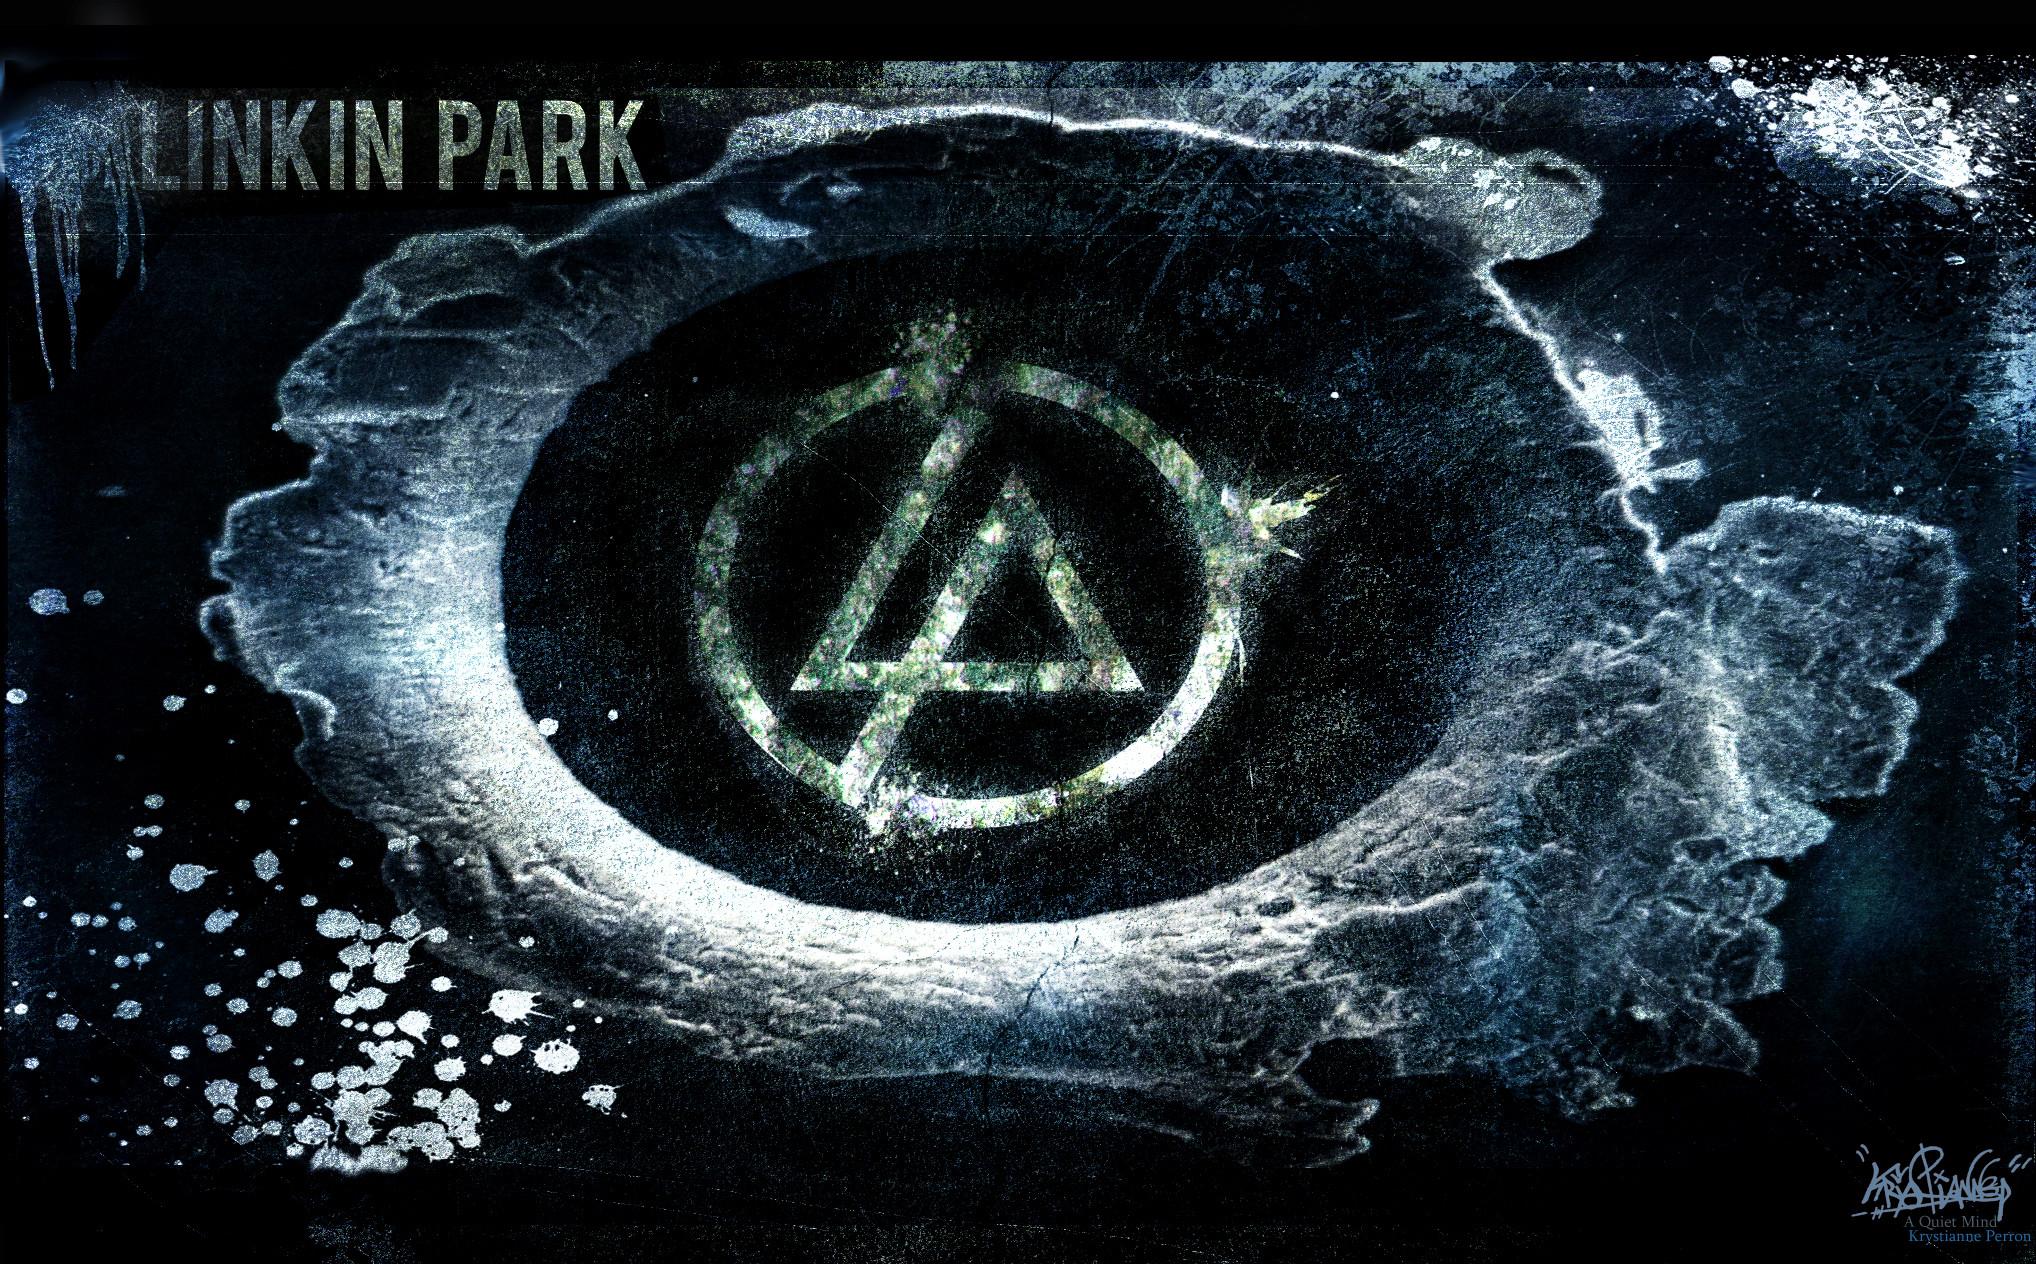 Linkin Park Wallpaper Hd 2018 69 Images